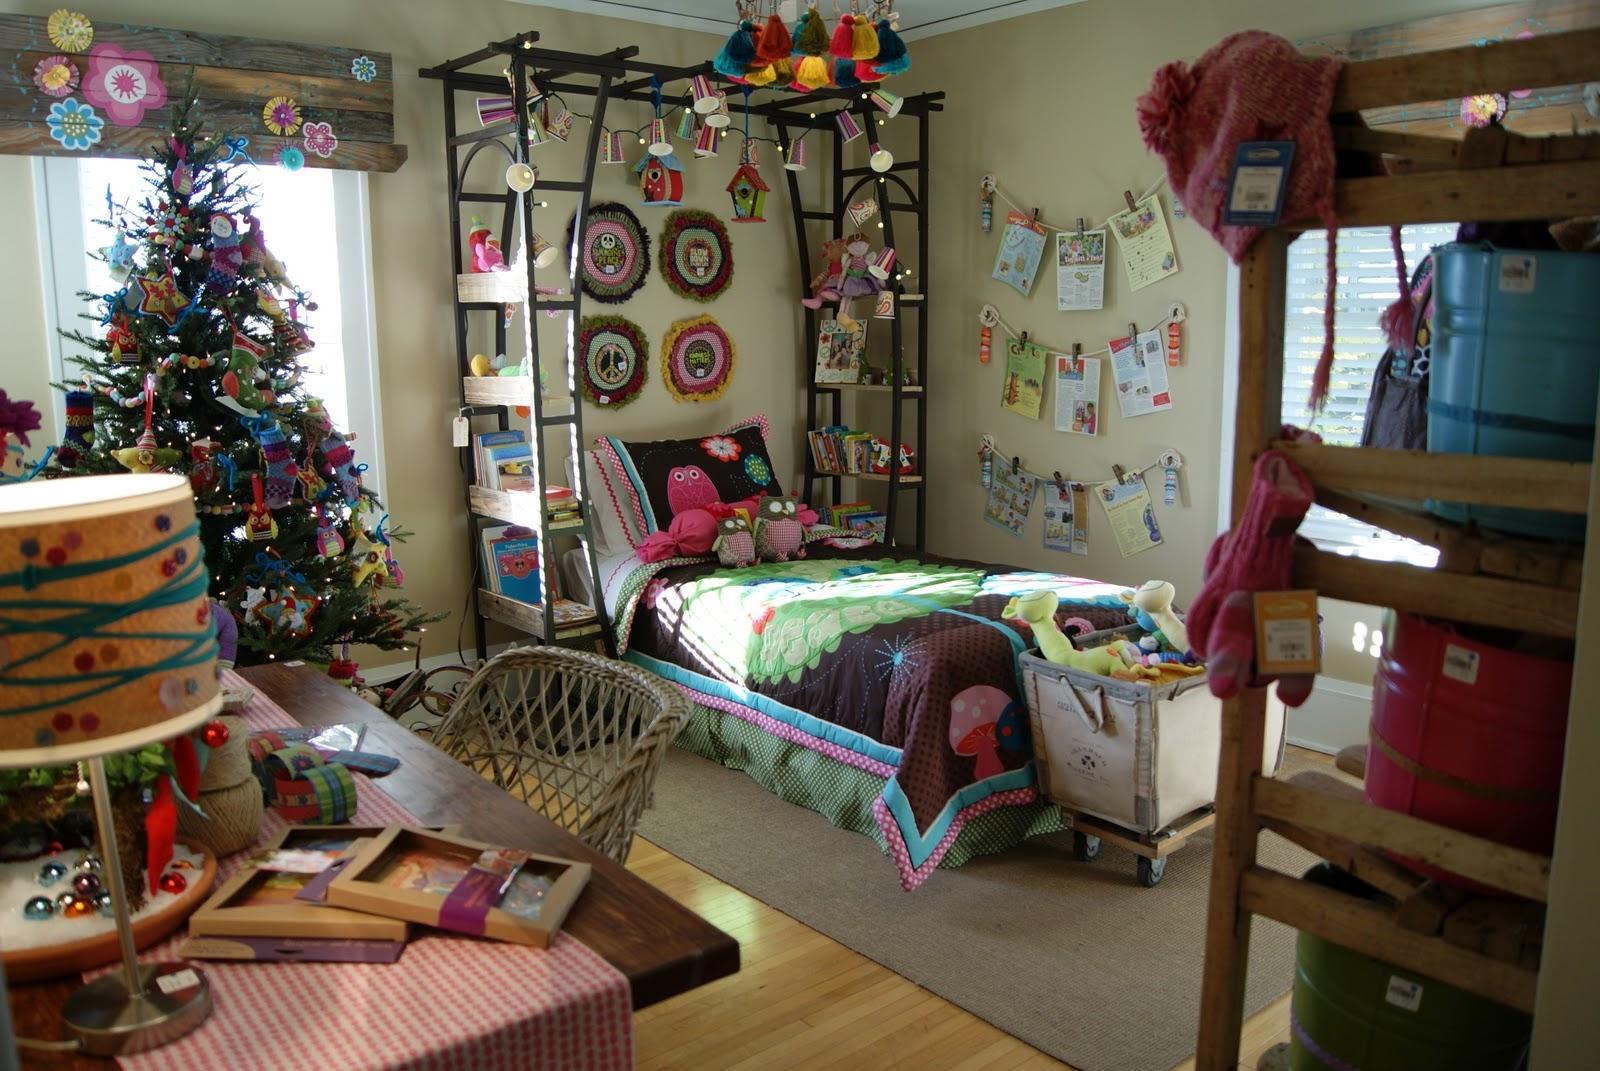 boho bedroom ideas for girls minimalist bohemian bedroom bedroom with  mattress on floor bohemian bedroom ideas